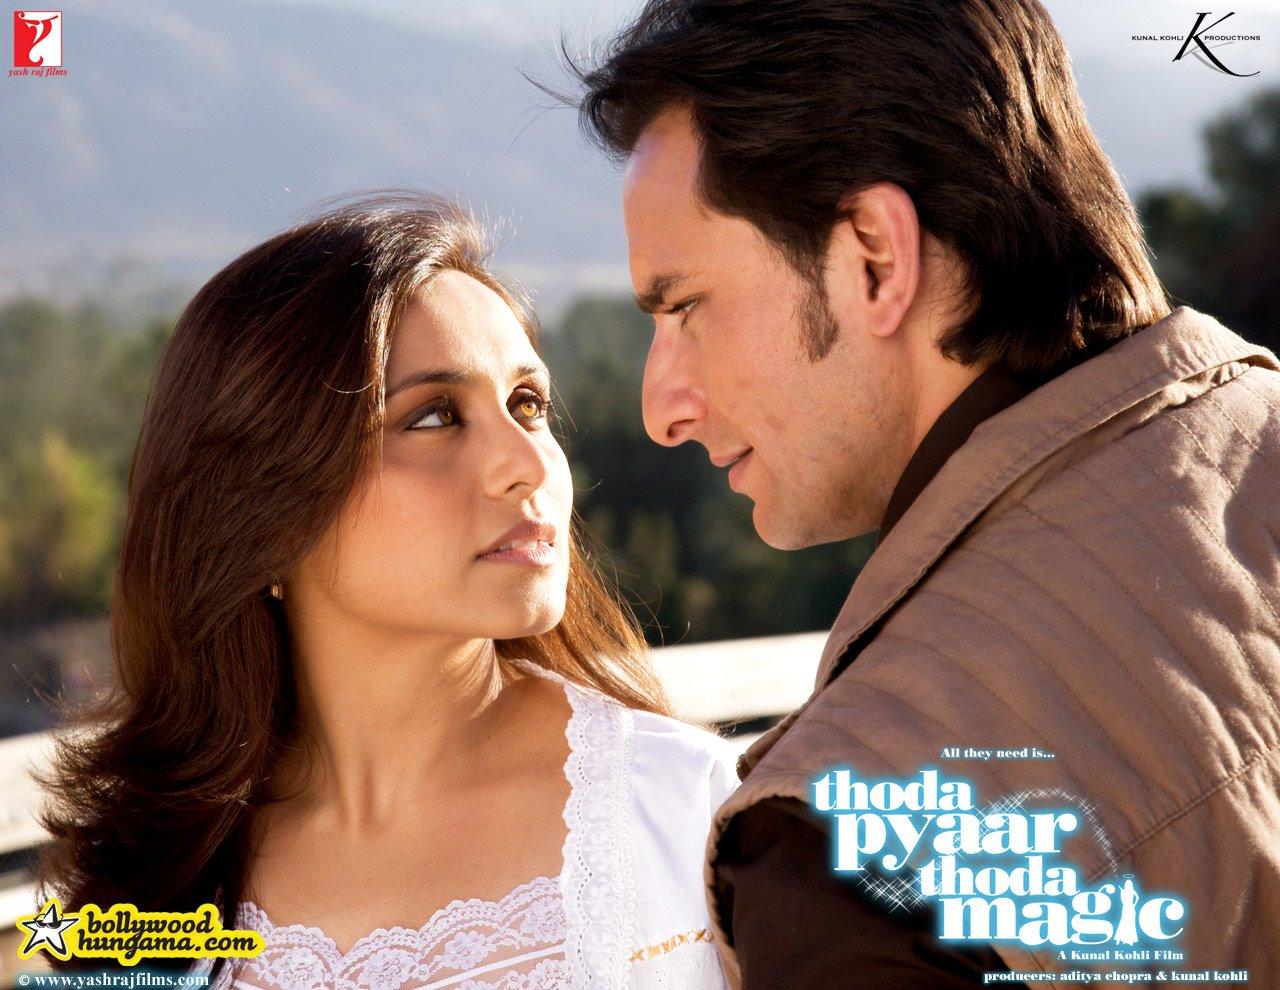 http://i.indiafm.com/posters/movies/08/thodapyaarthodamagic/still5.jpg